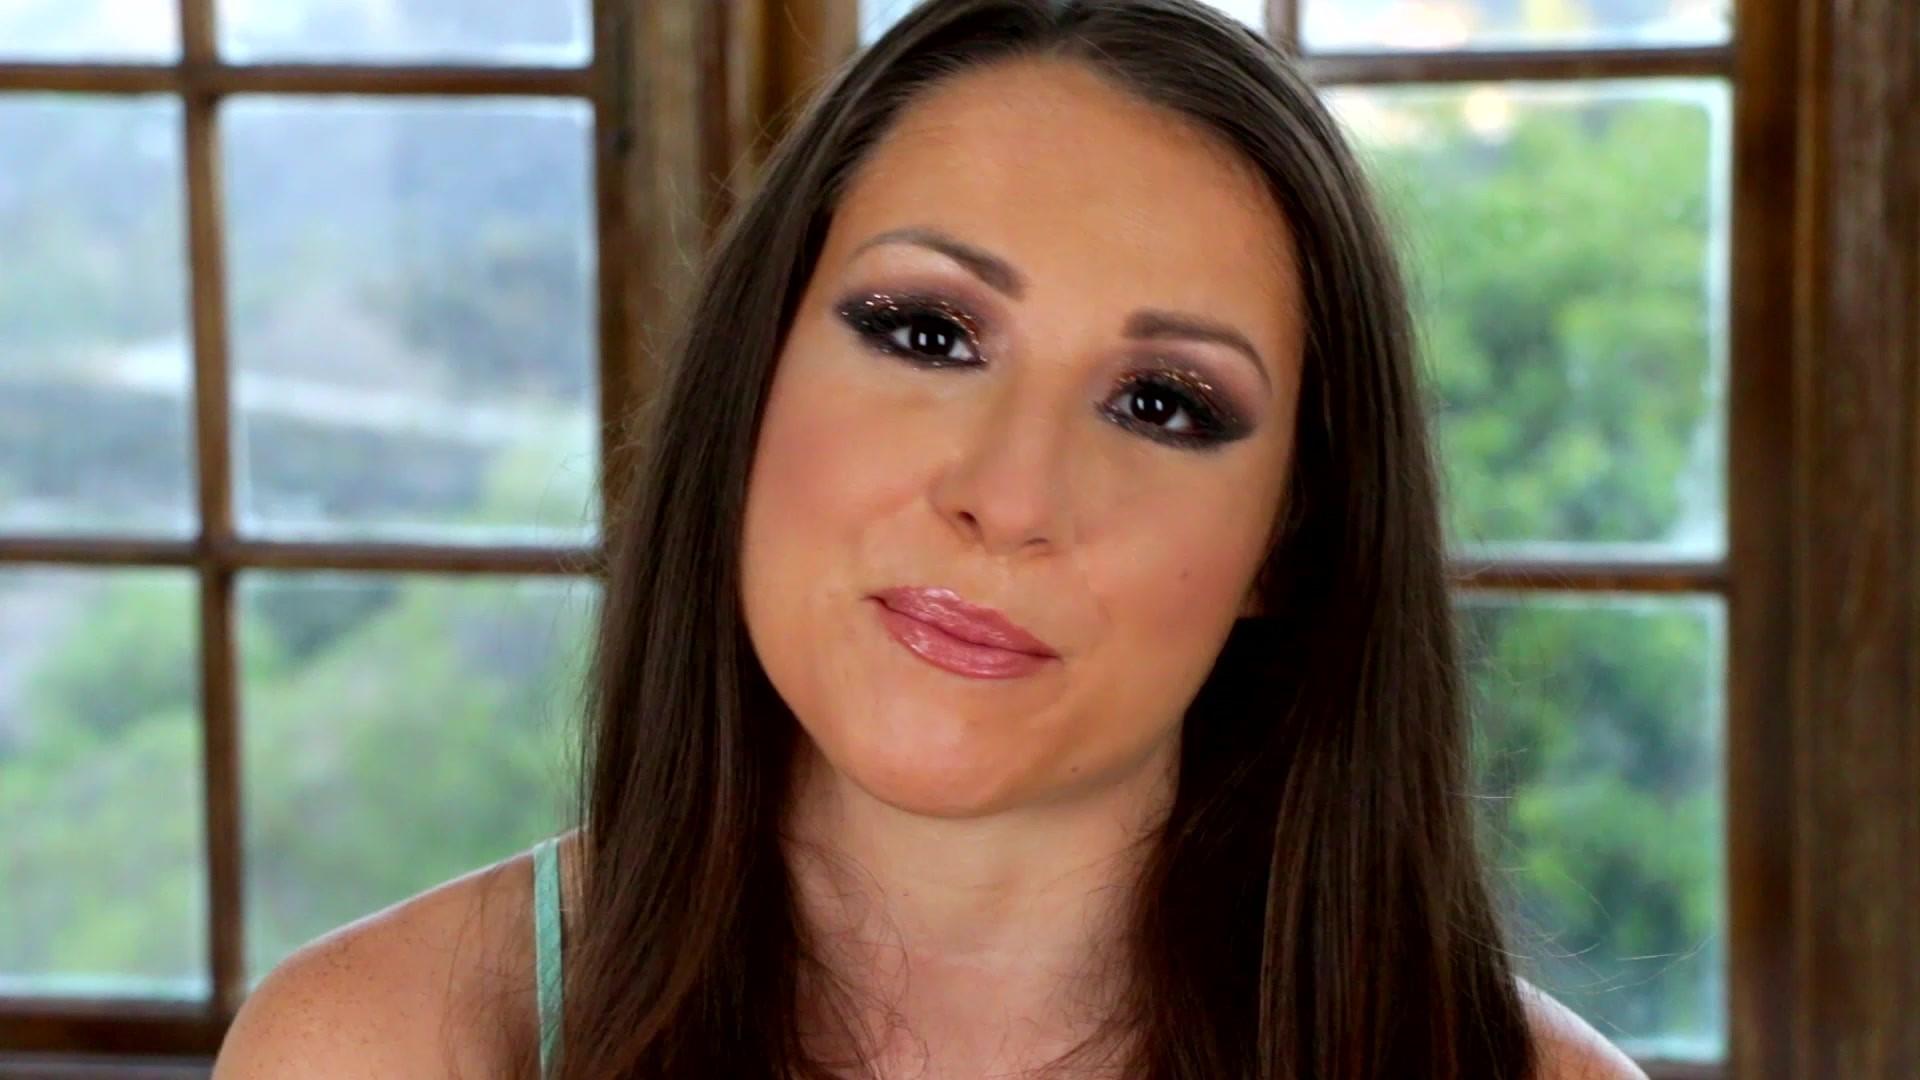 Jada Stevens Porn - HD Adult Videos - SpankBang